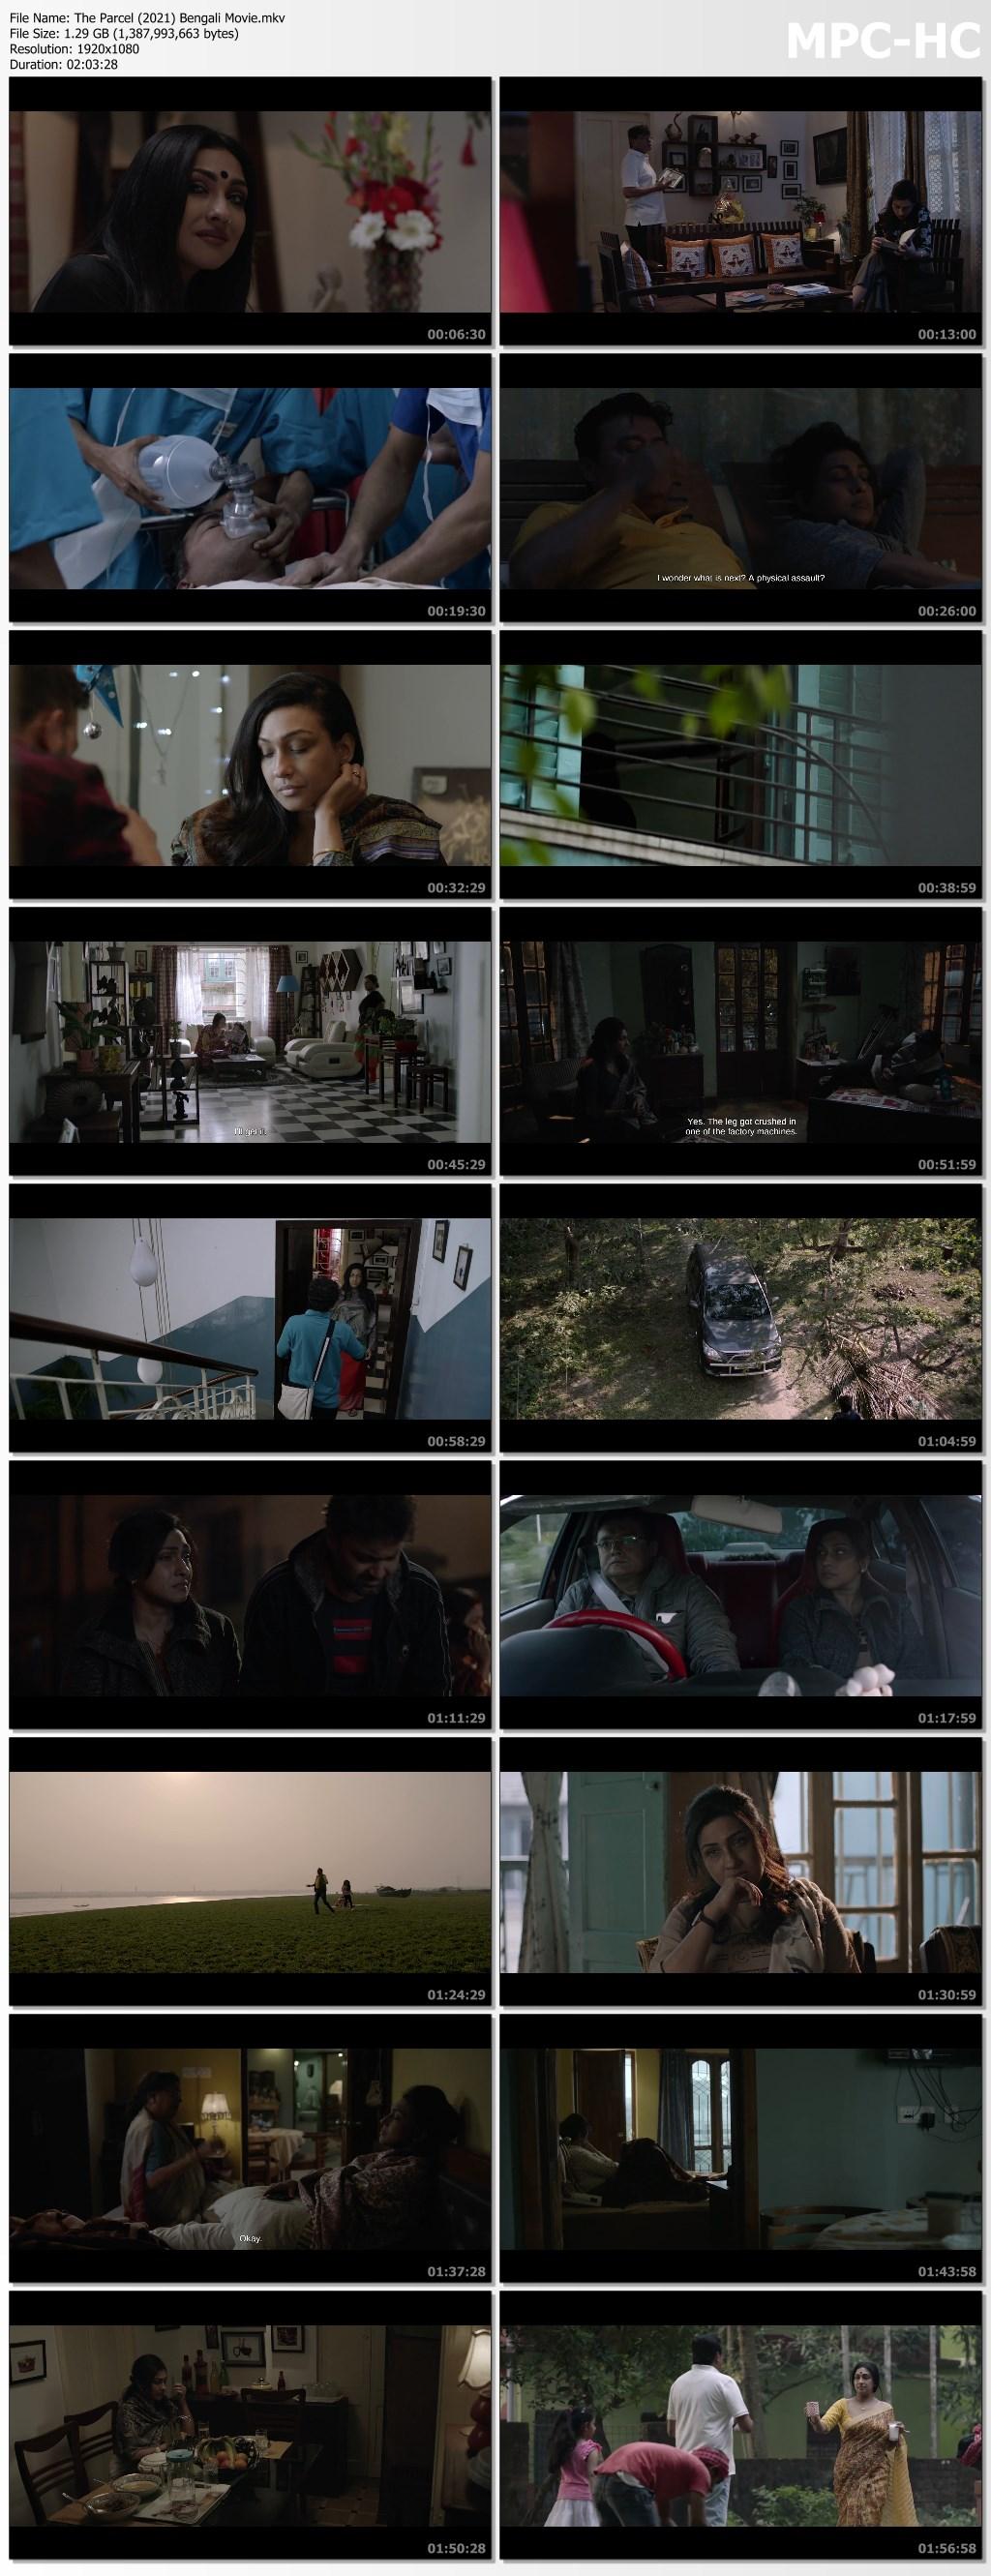 The Parcel (2021) Bengali Movie.mkv thumbs